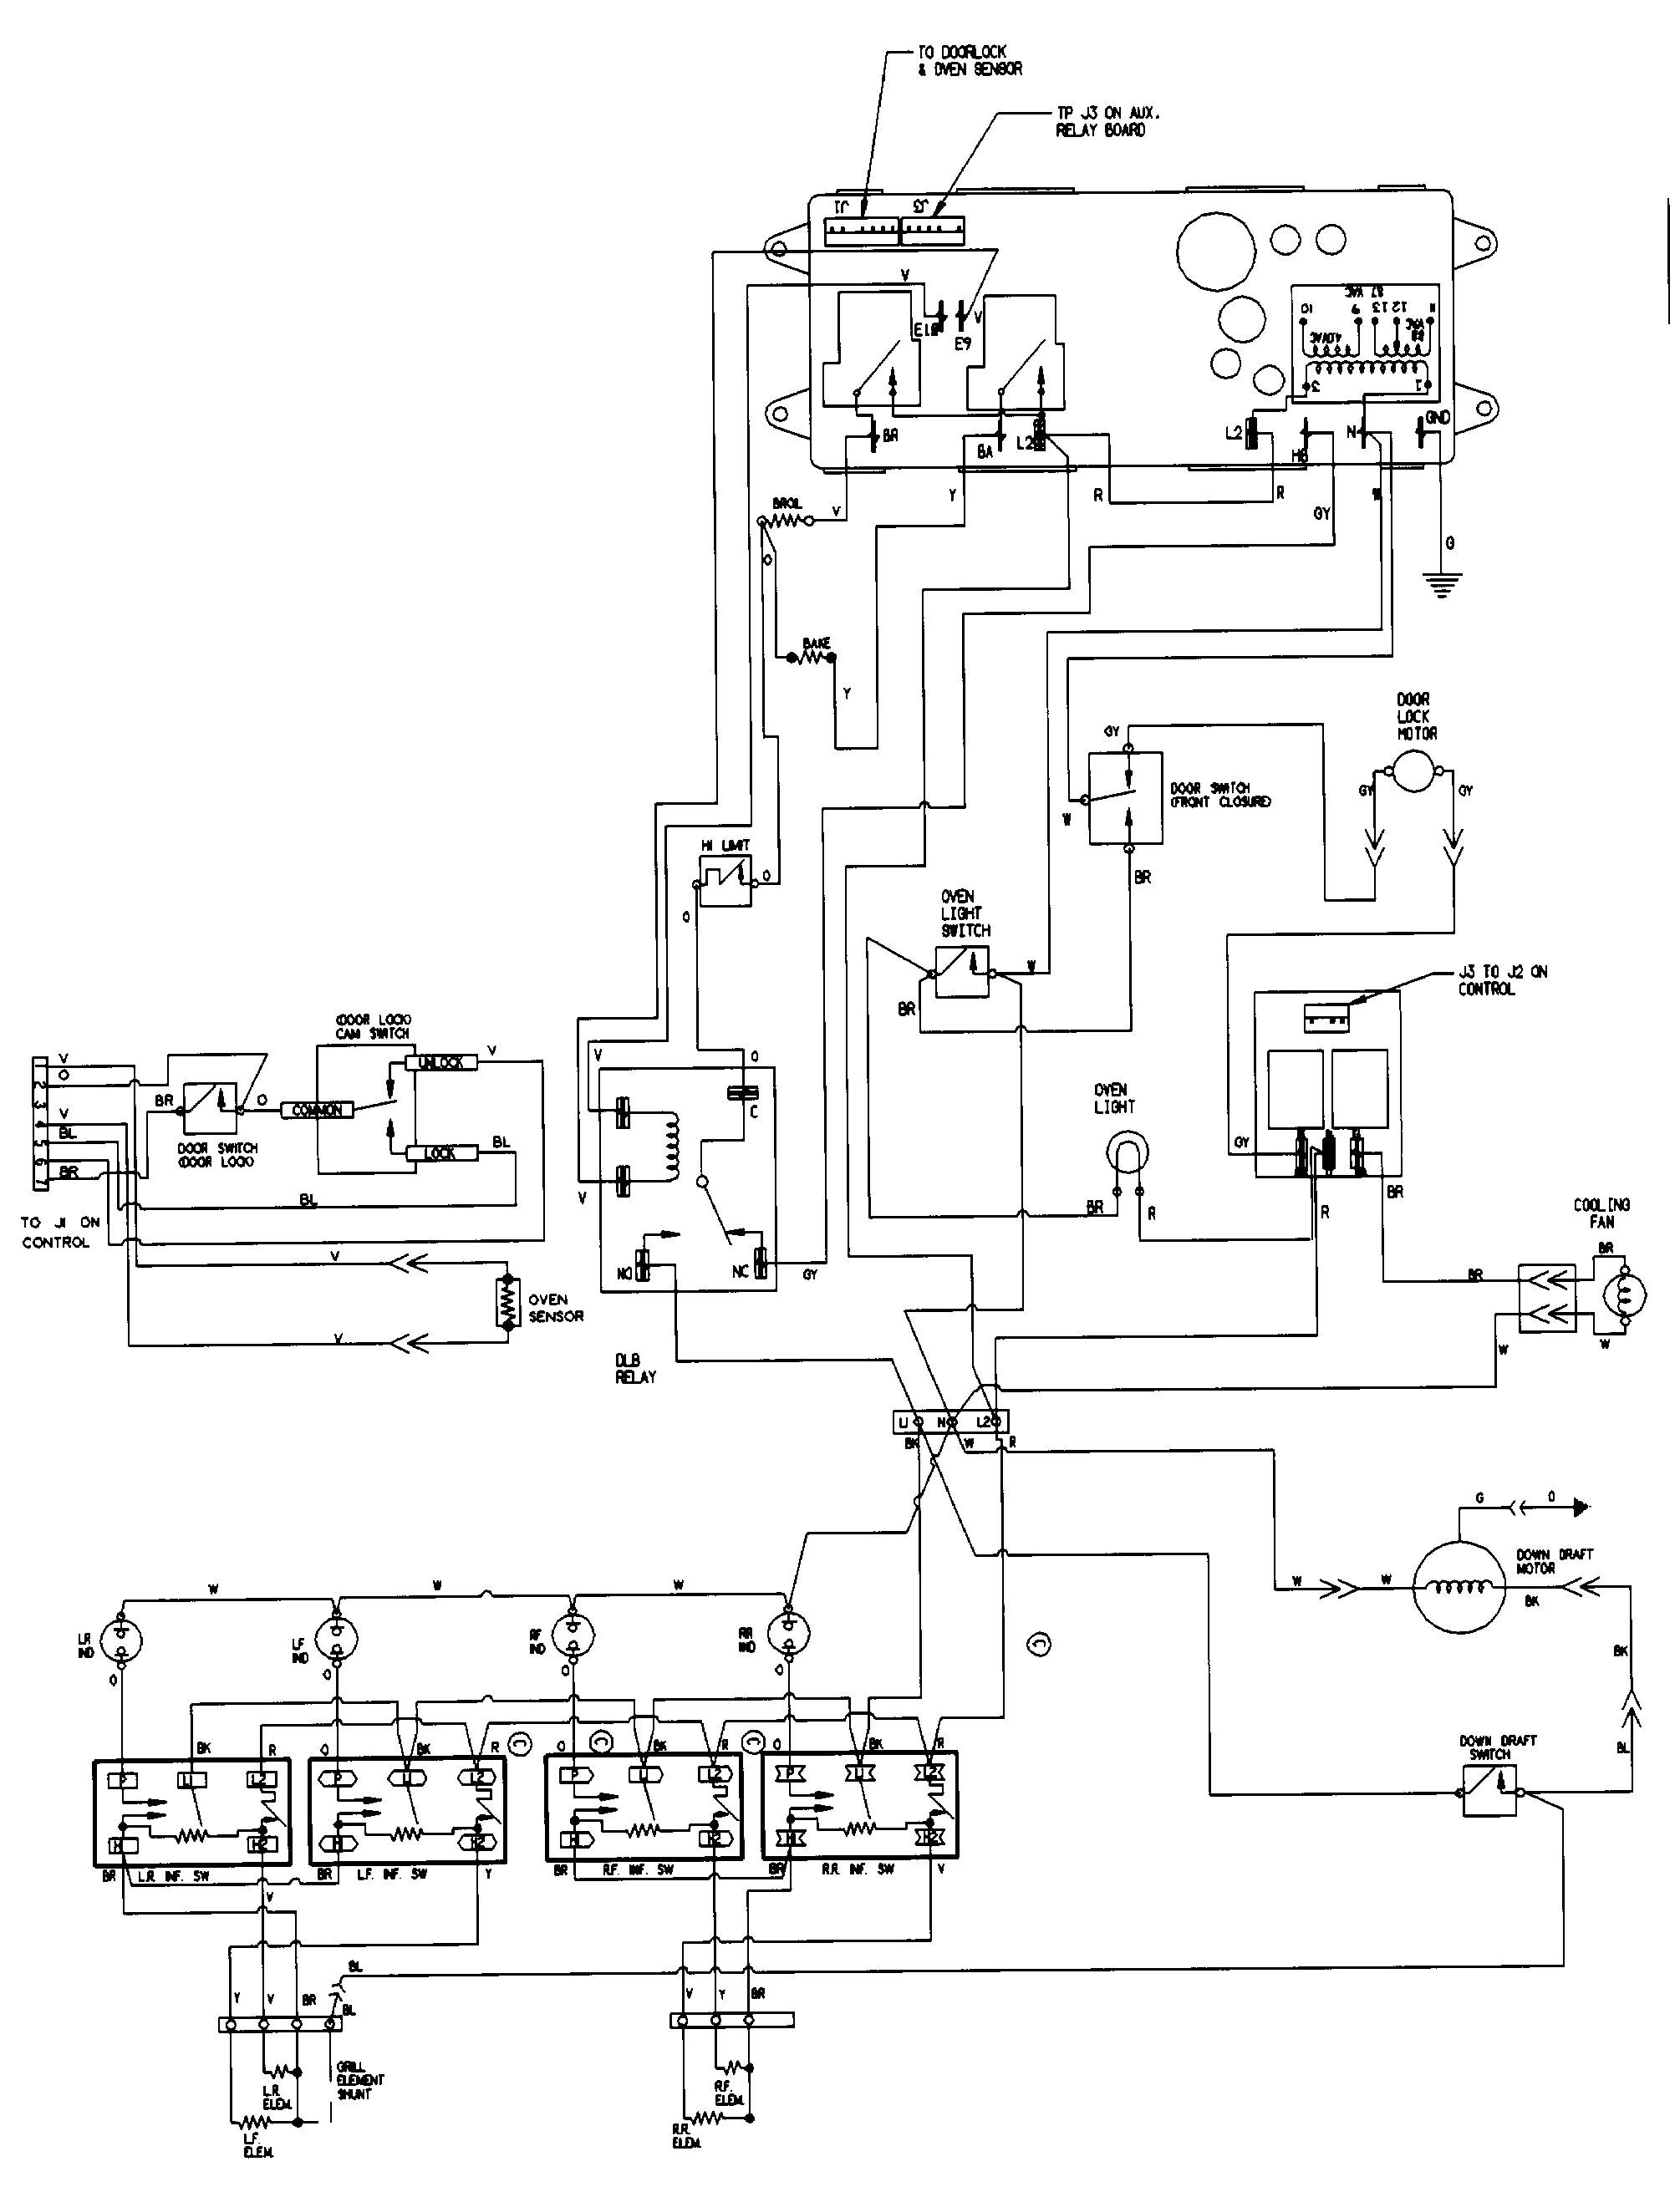 2000 mitsubishi montero sport 3 0 engine diagram wiring of way switches to lights my